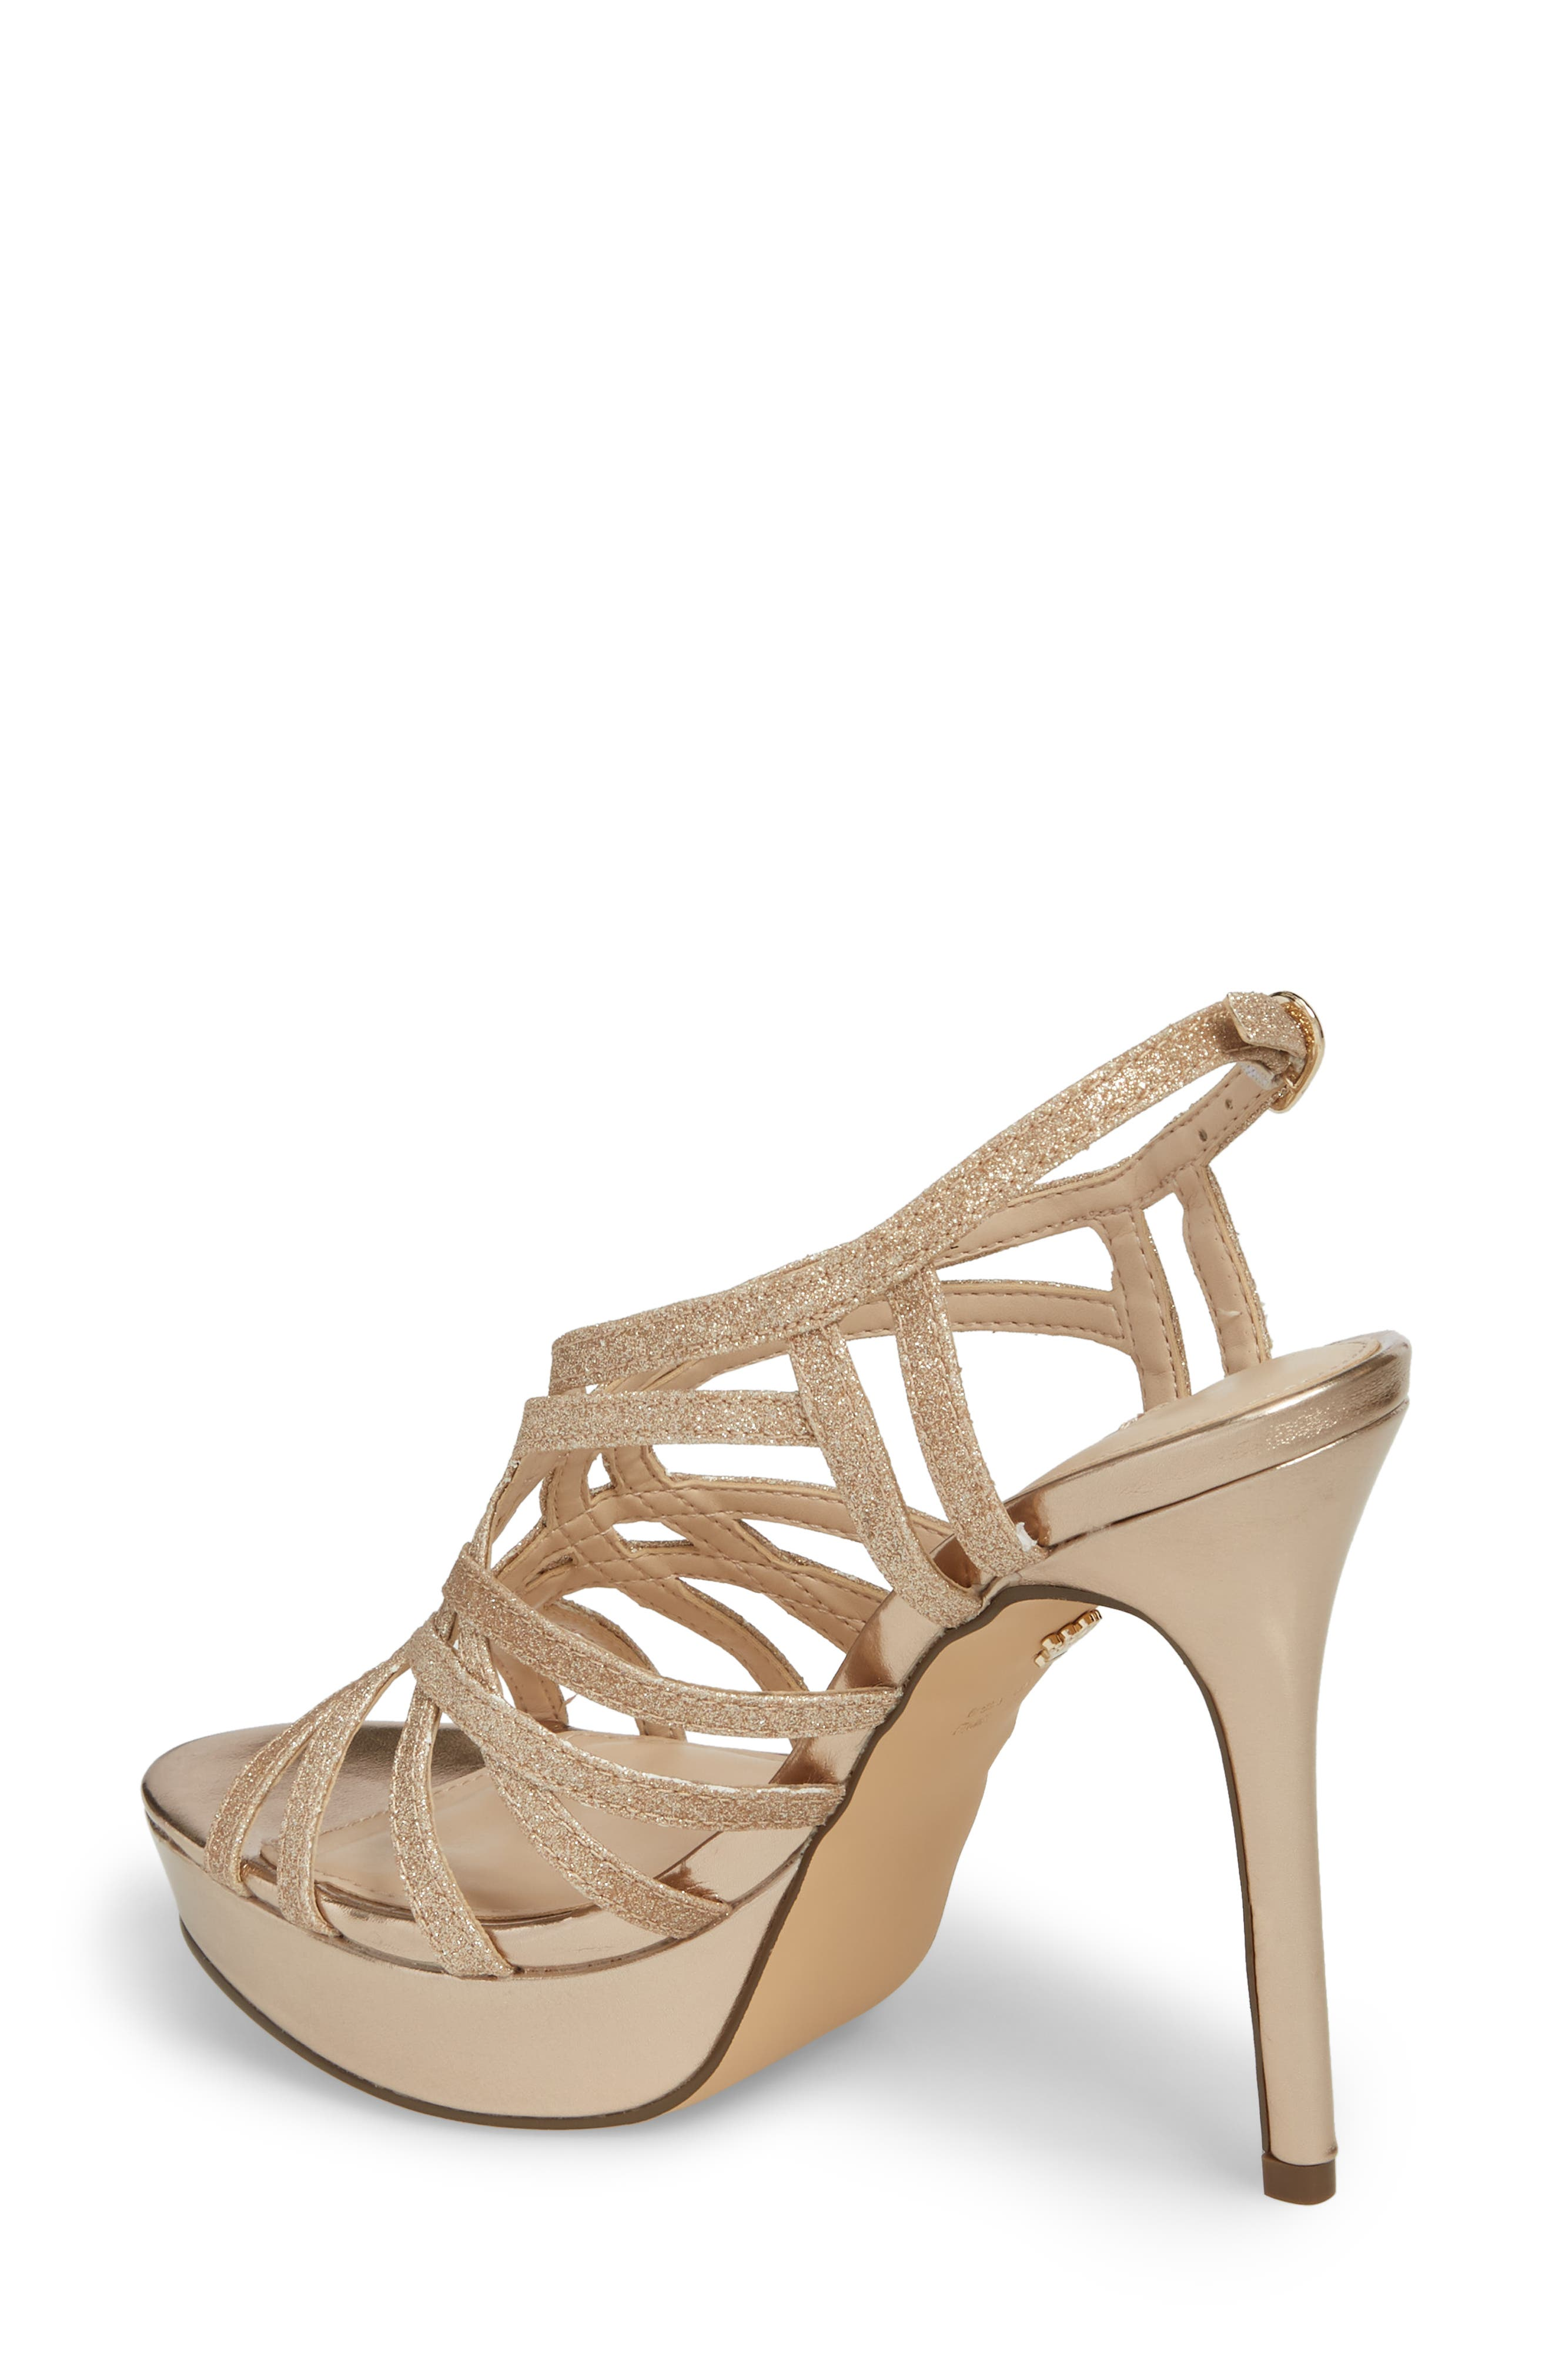 Solina Platform Sandal,                             Alternate thumbnail 2, color,                             Gold Glitter Fabric